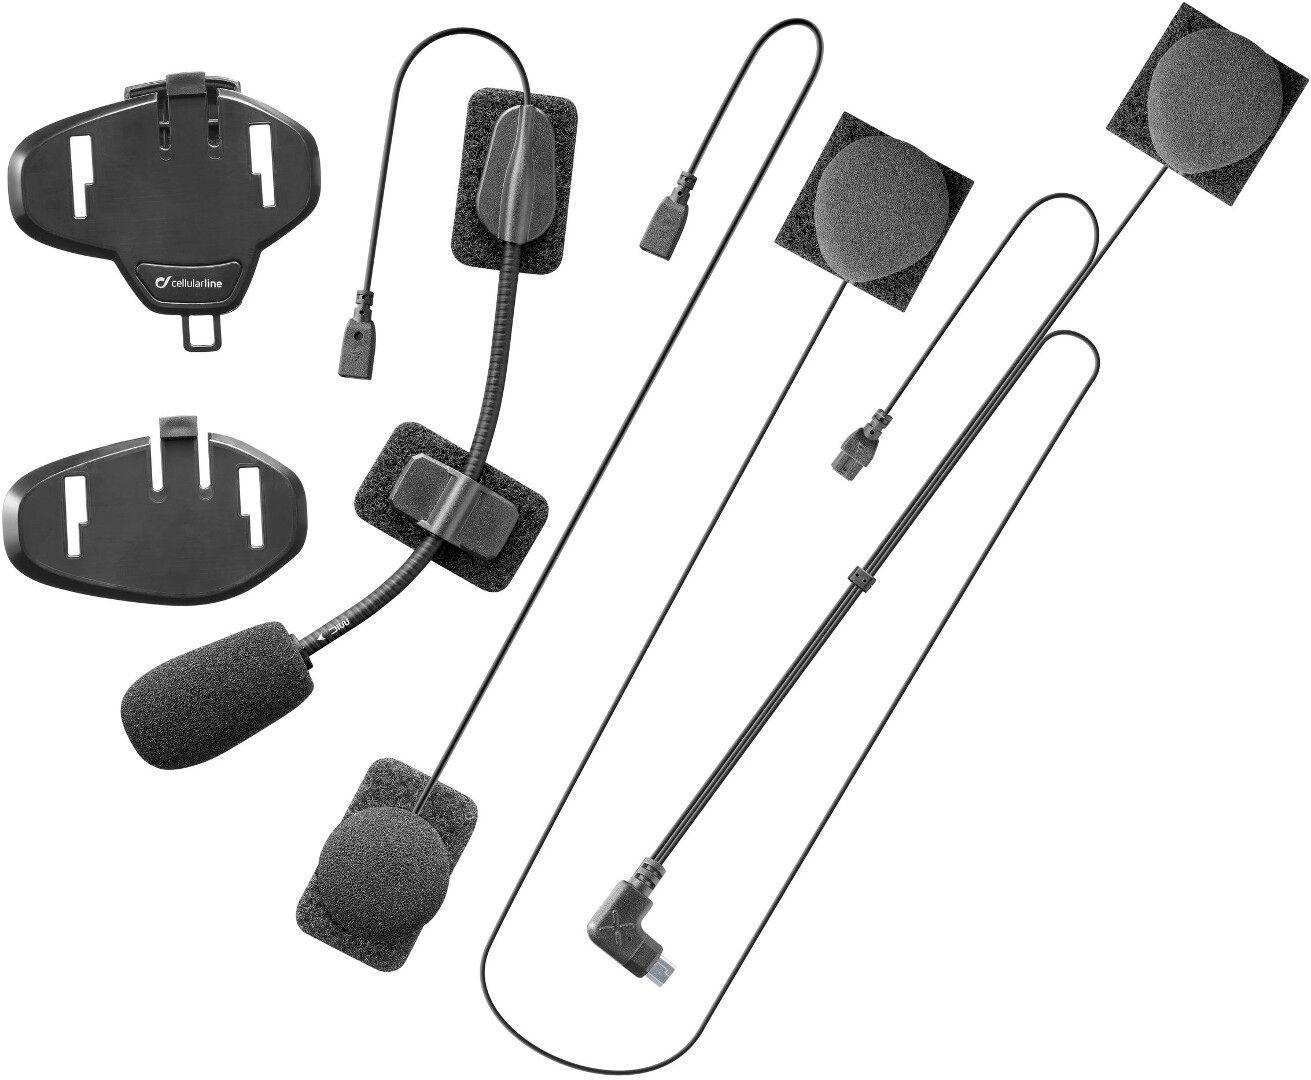 interphone avant / tour / sport / link / urban kit audio universale